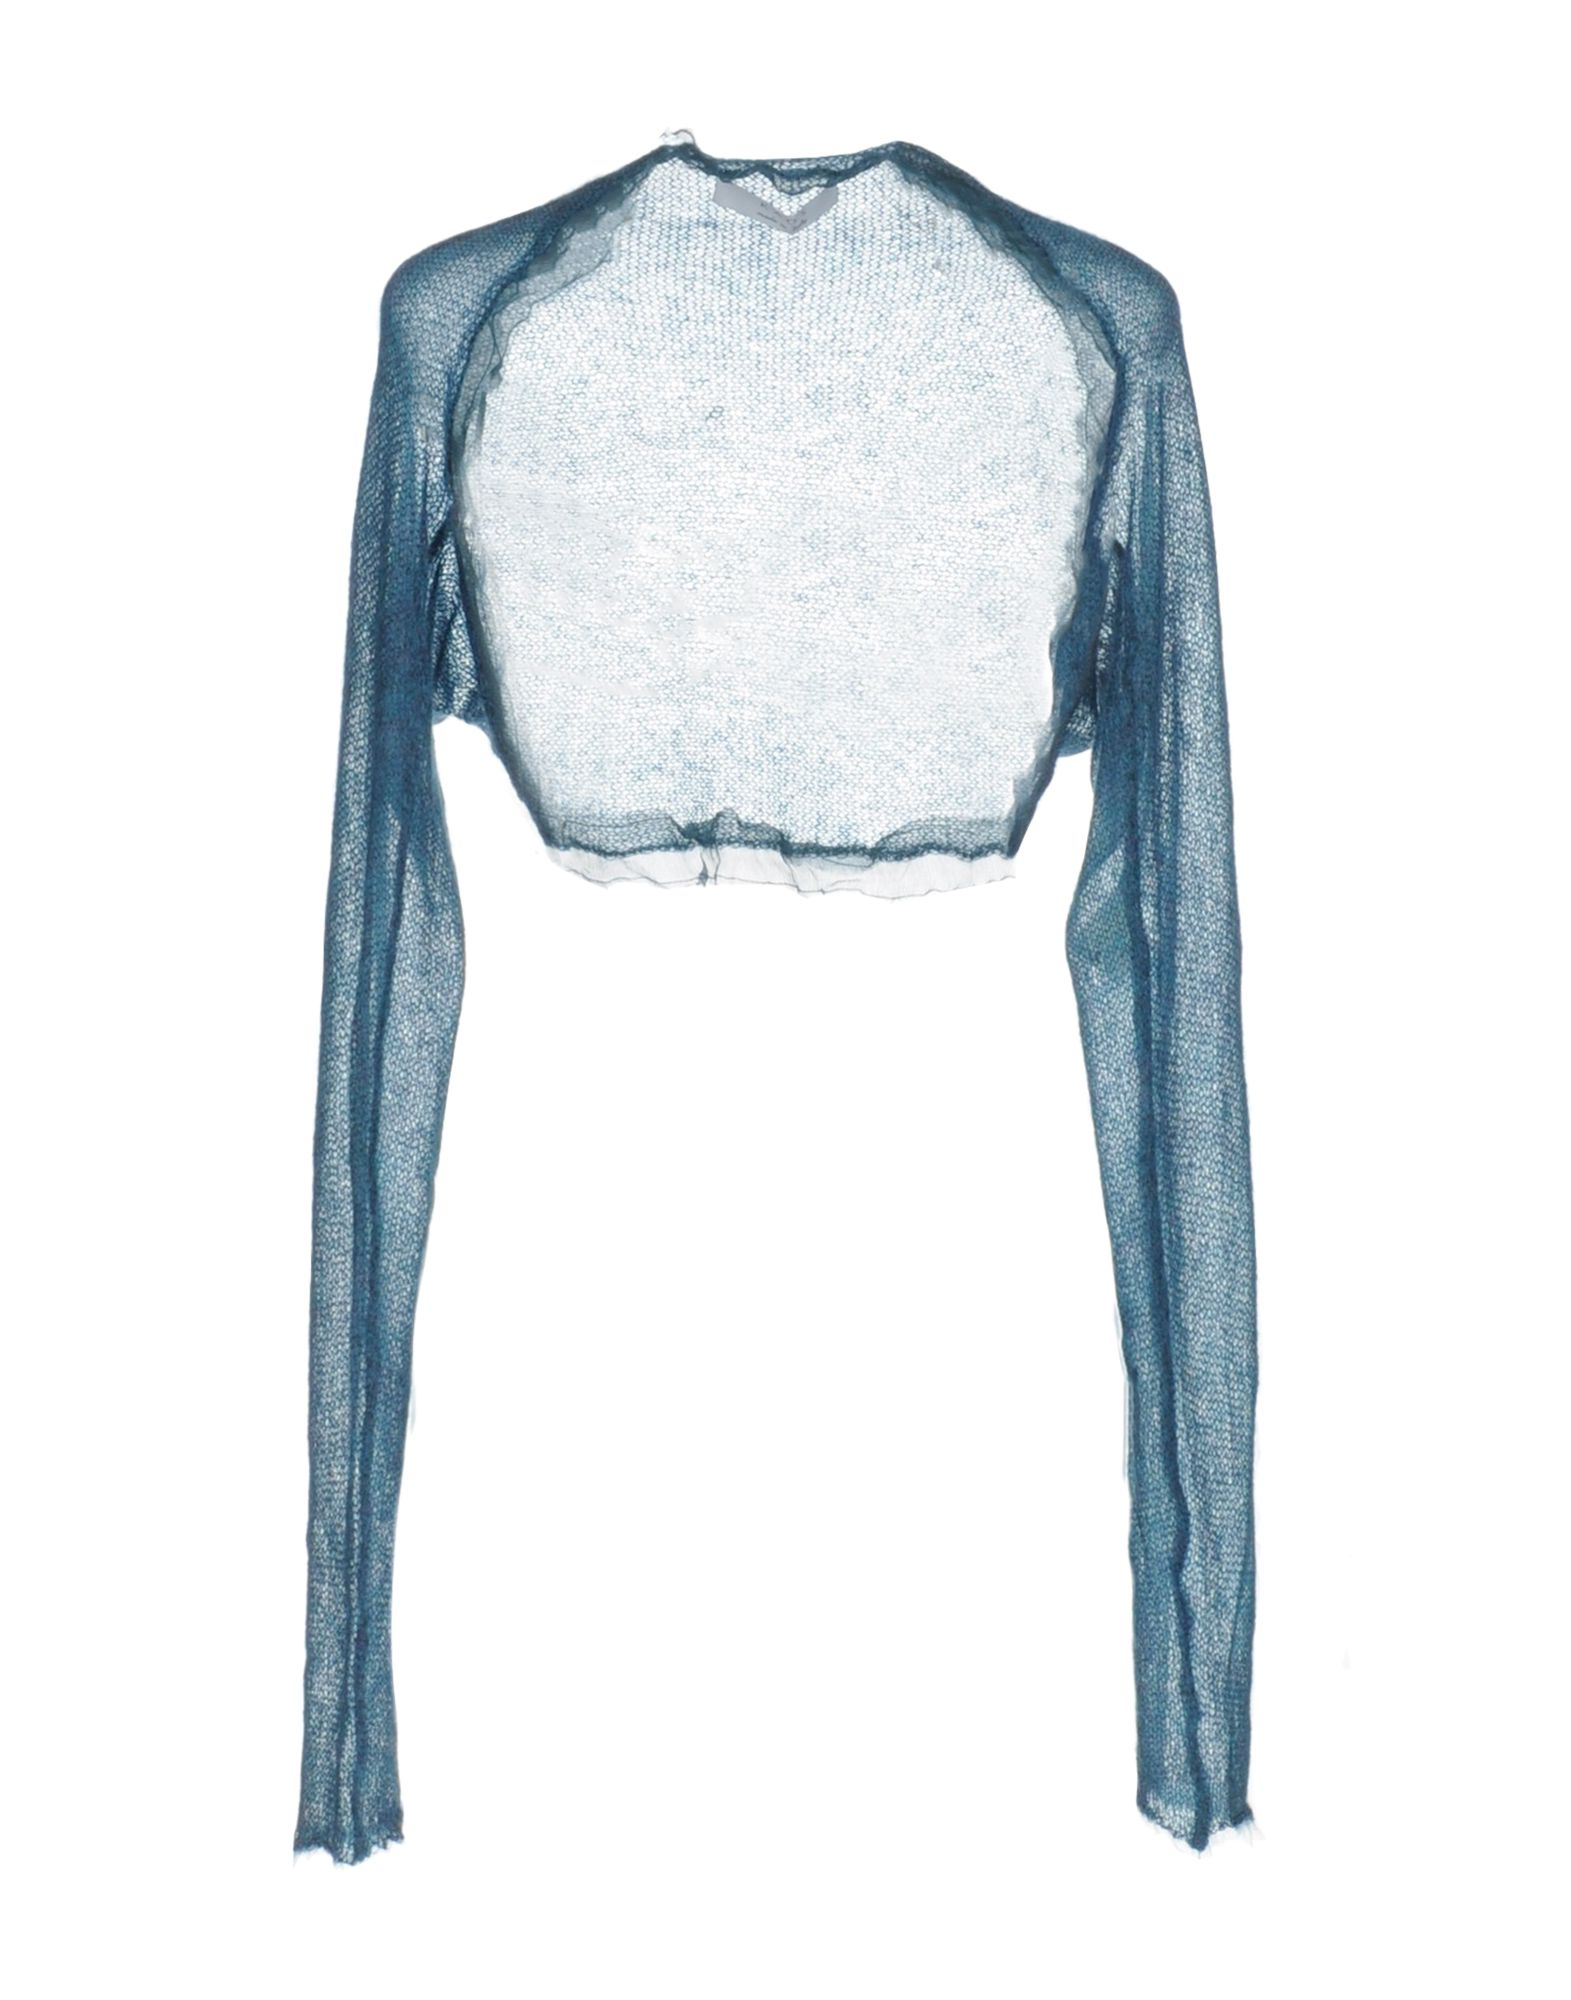 KAOS Damen Bolero Farbe Blaugrau Größe 5